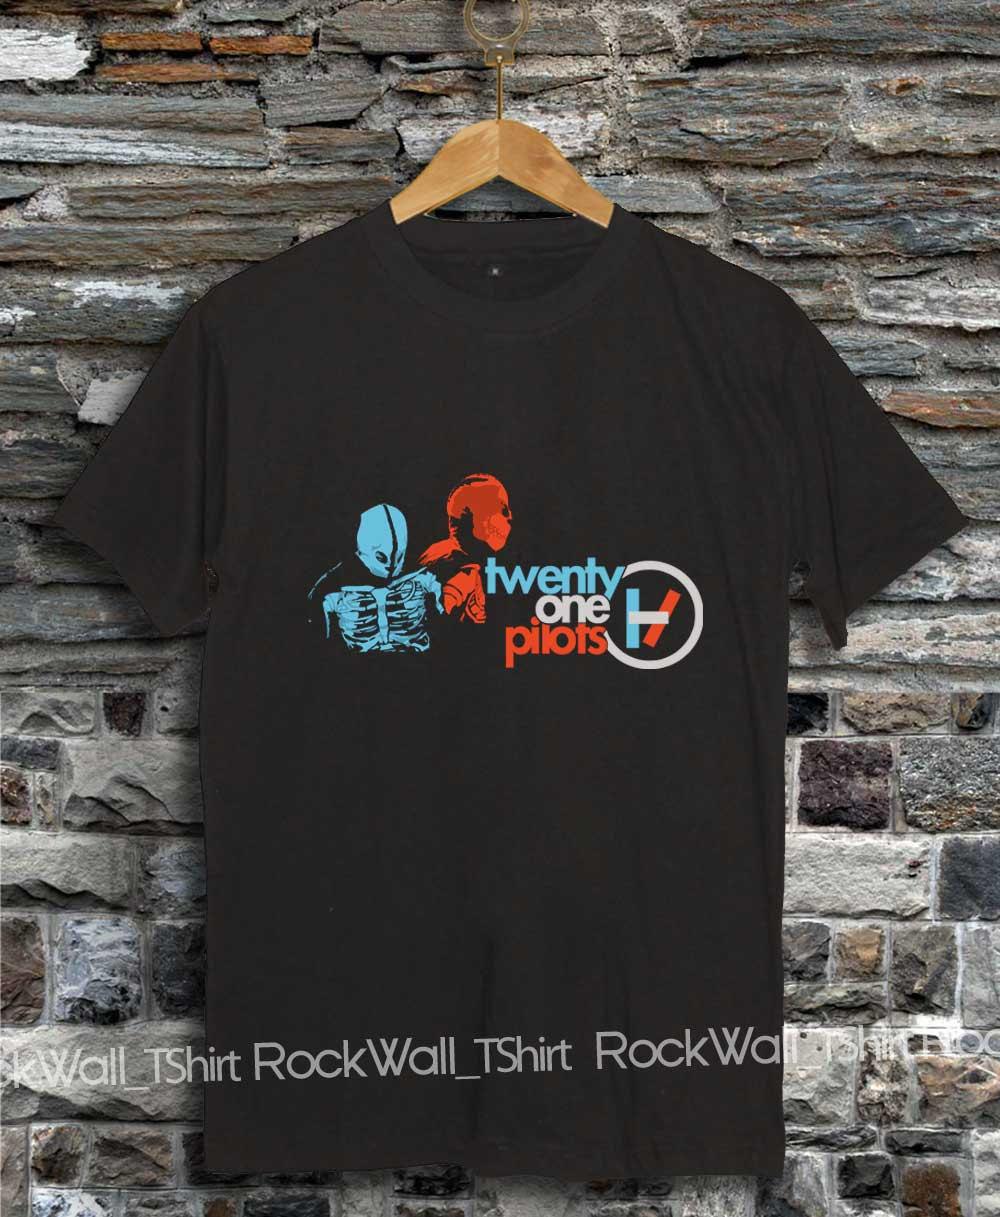 21 Pilots Shirt Tshirt T Shirt Twenty One Pilots Shirt Printed Black And